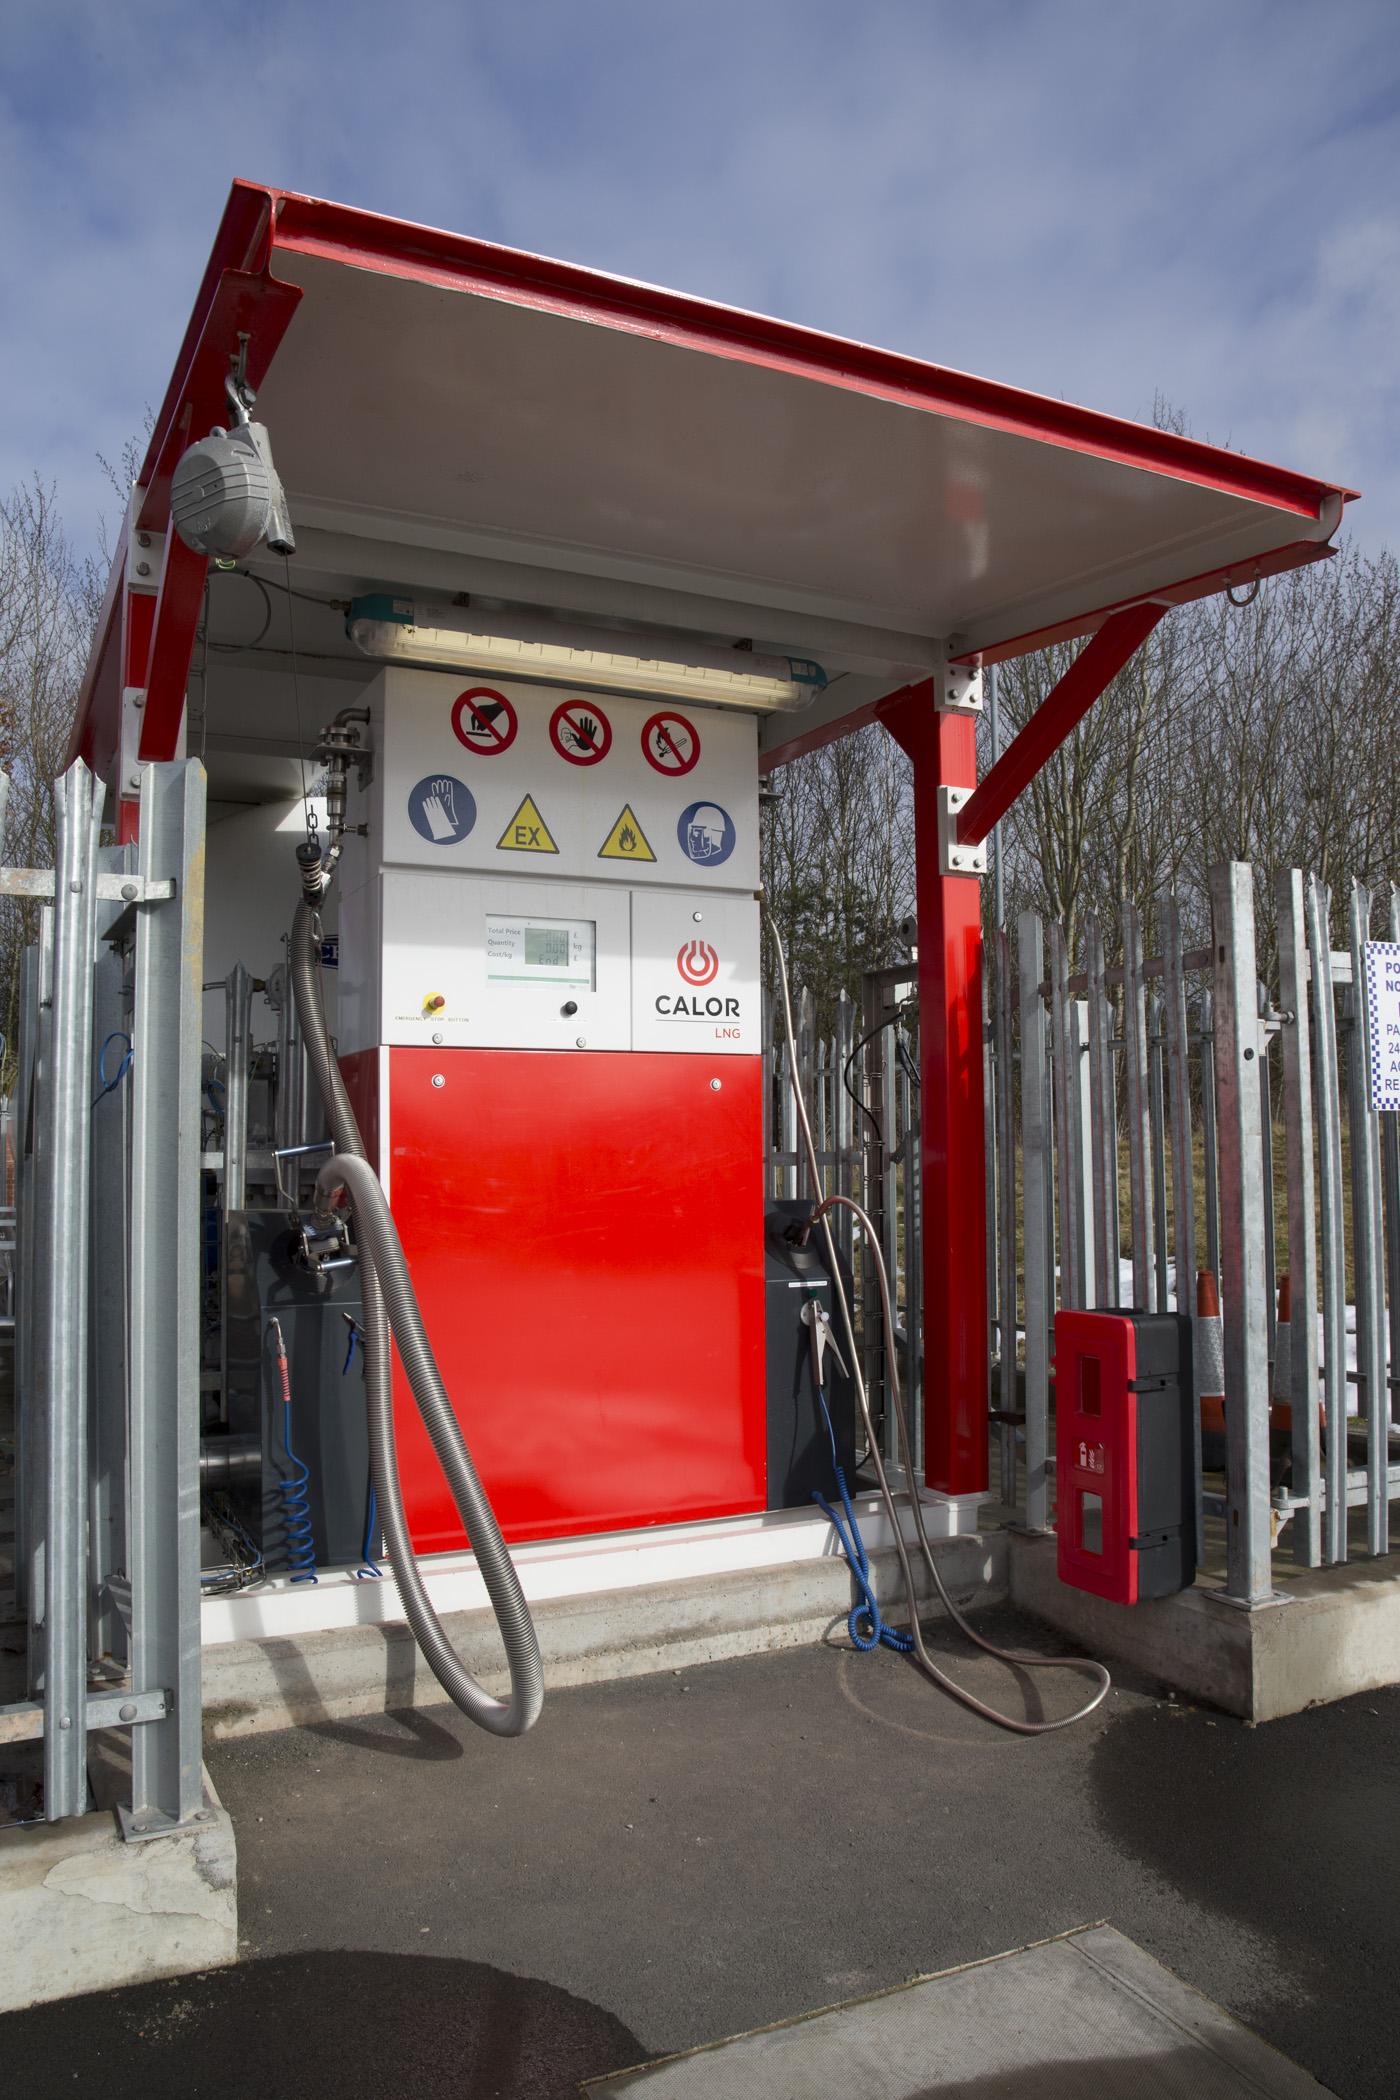 Calor LNG refuelling stations for UK roads